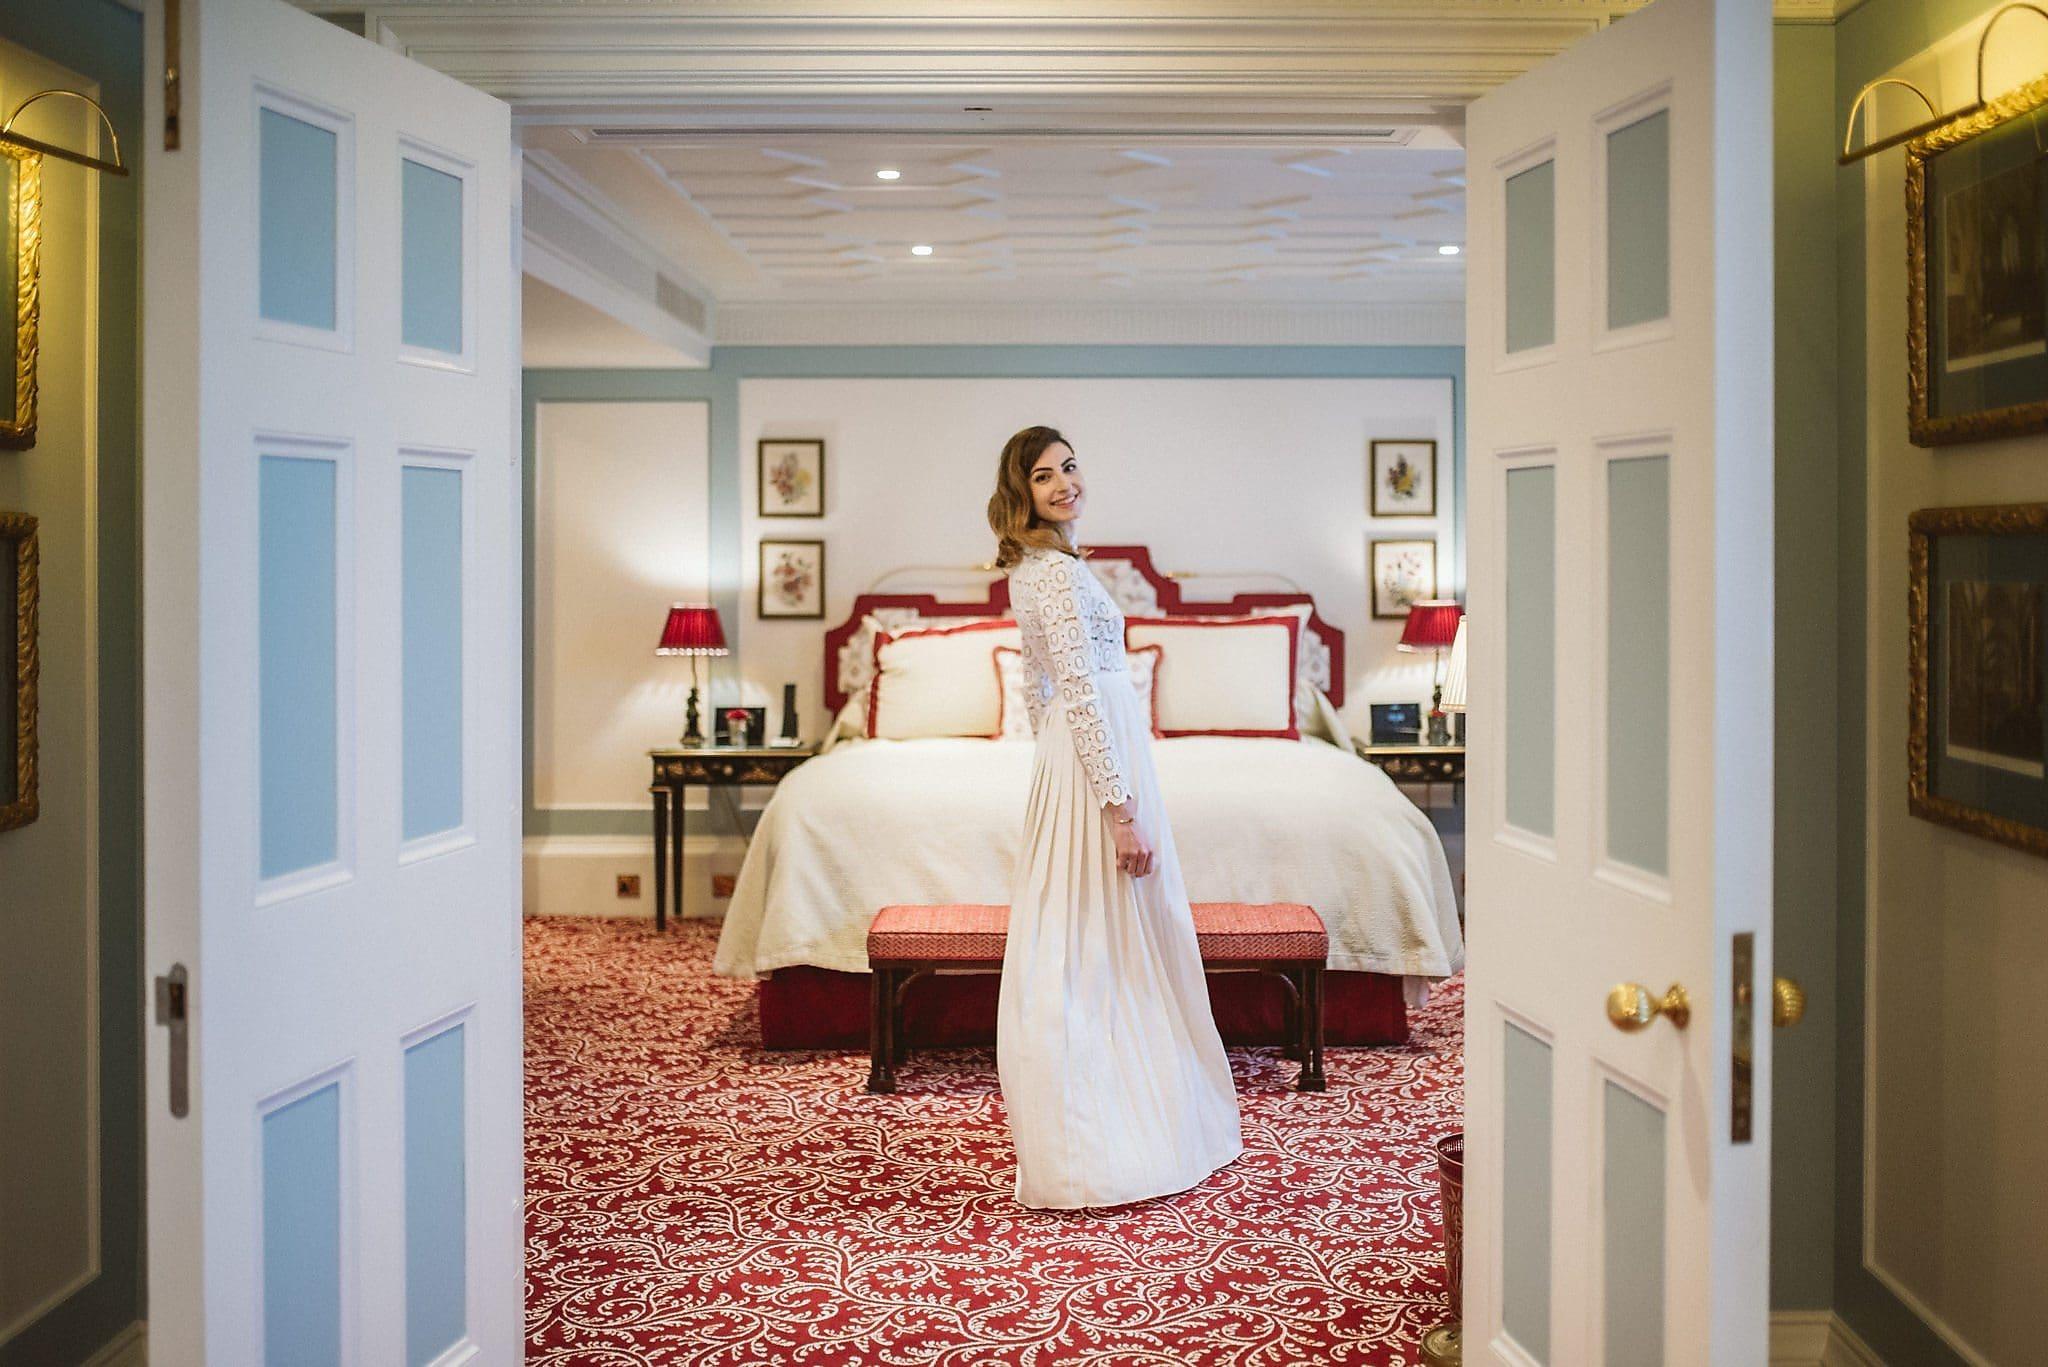 Bride in wedding dress twirls in bridal suite at her Lanesborough wedding